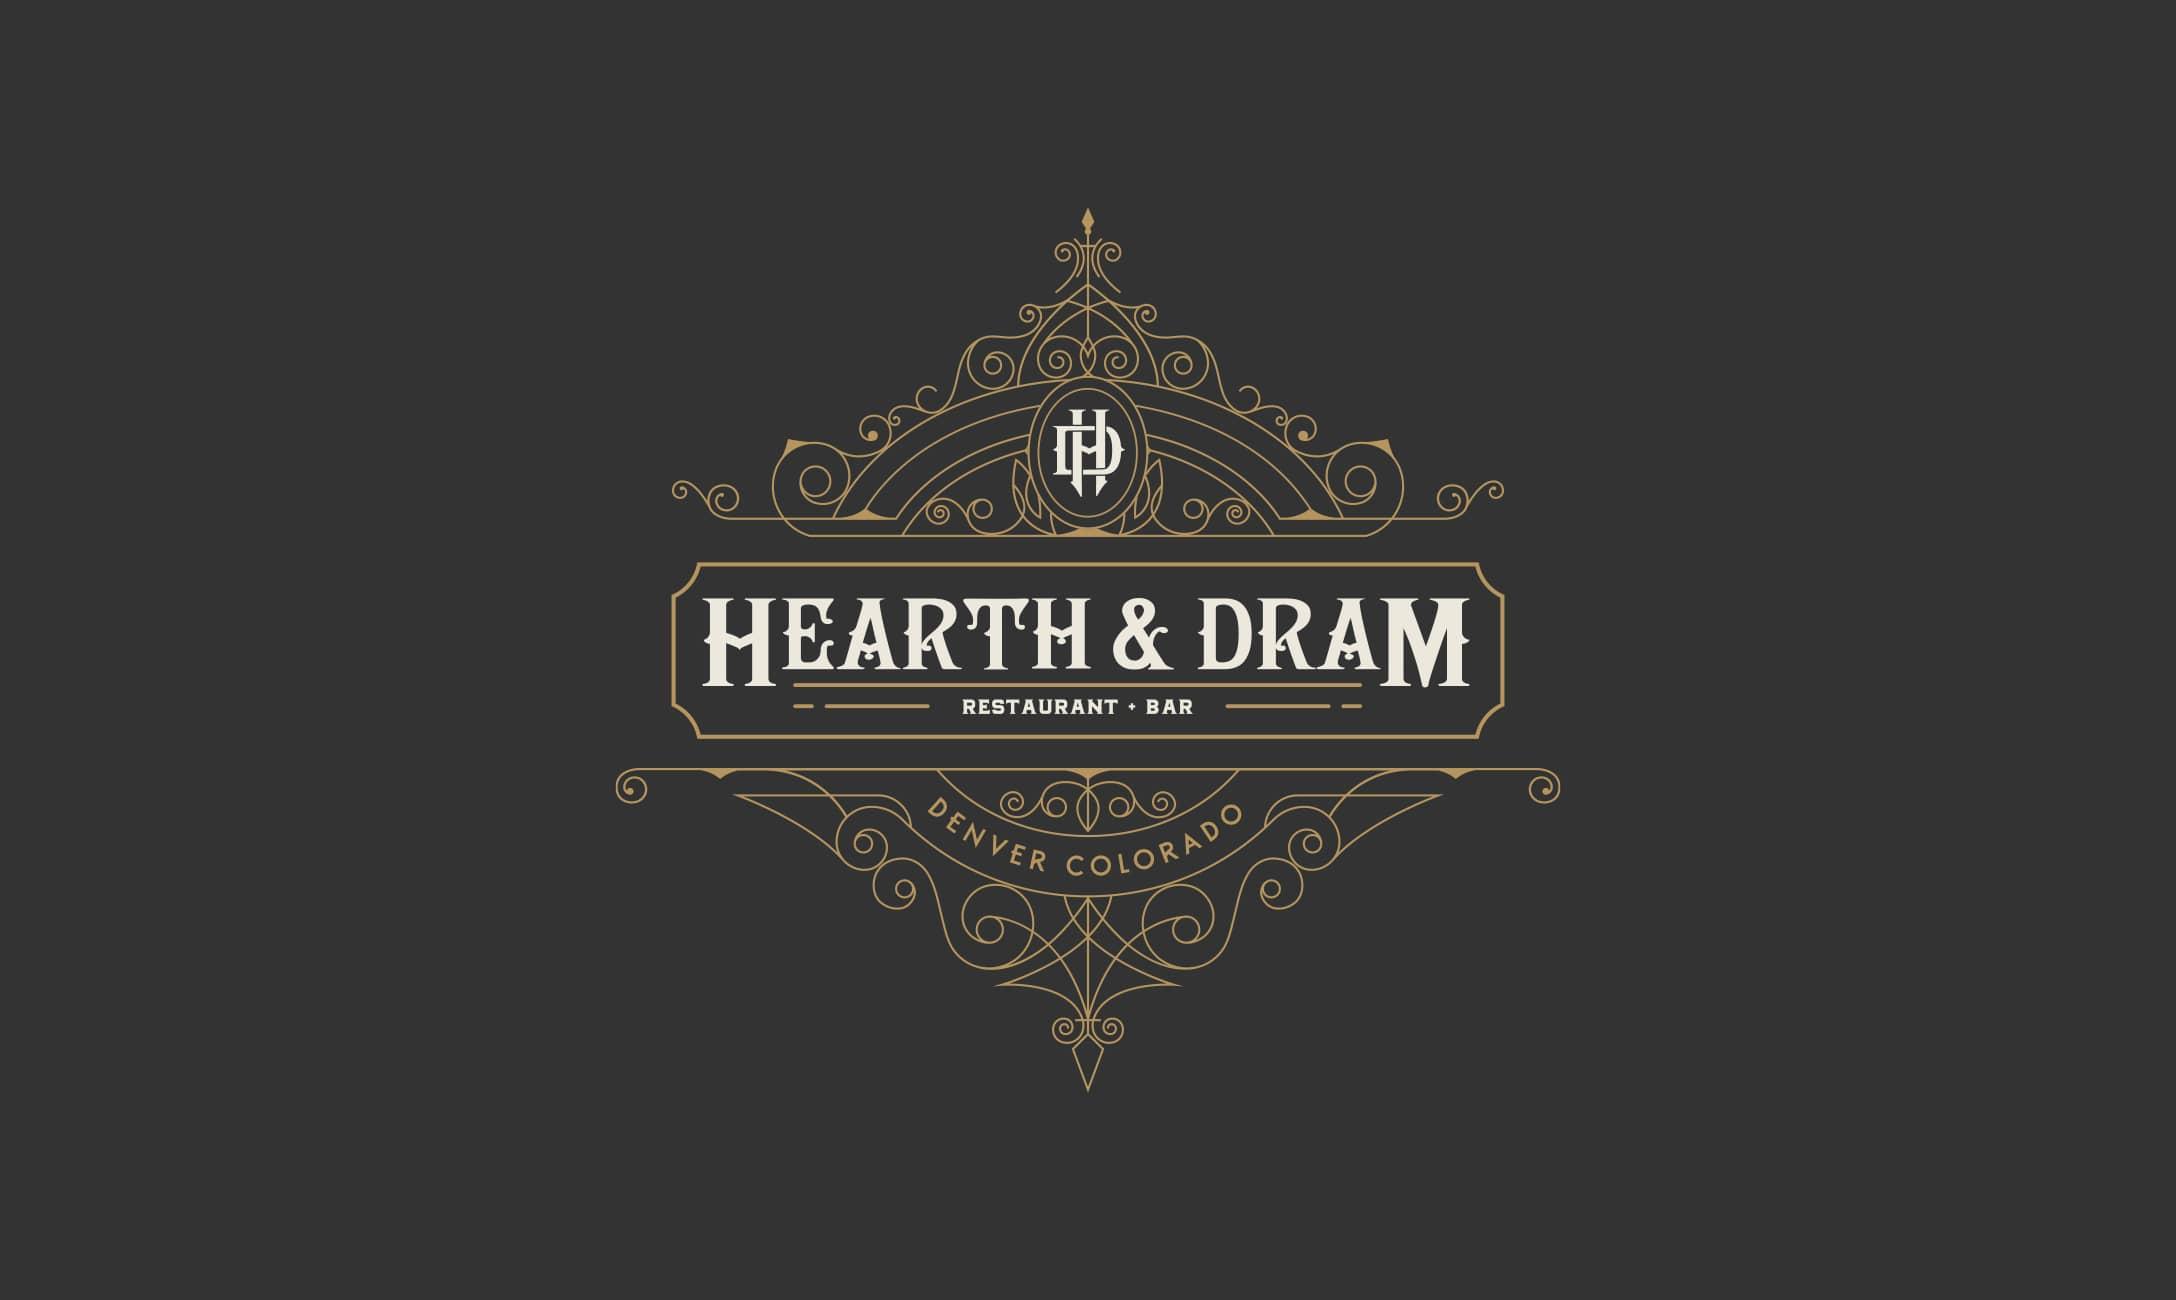 Hearth & Dram main logo